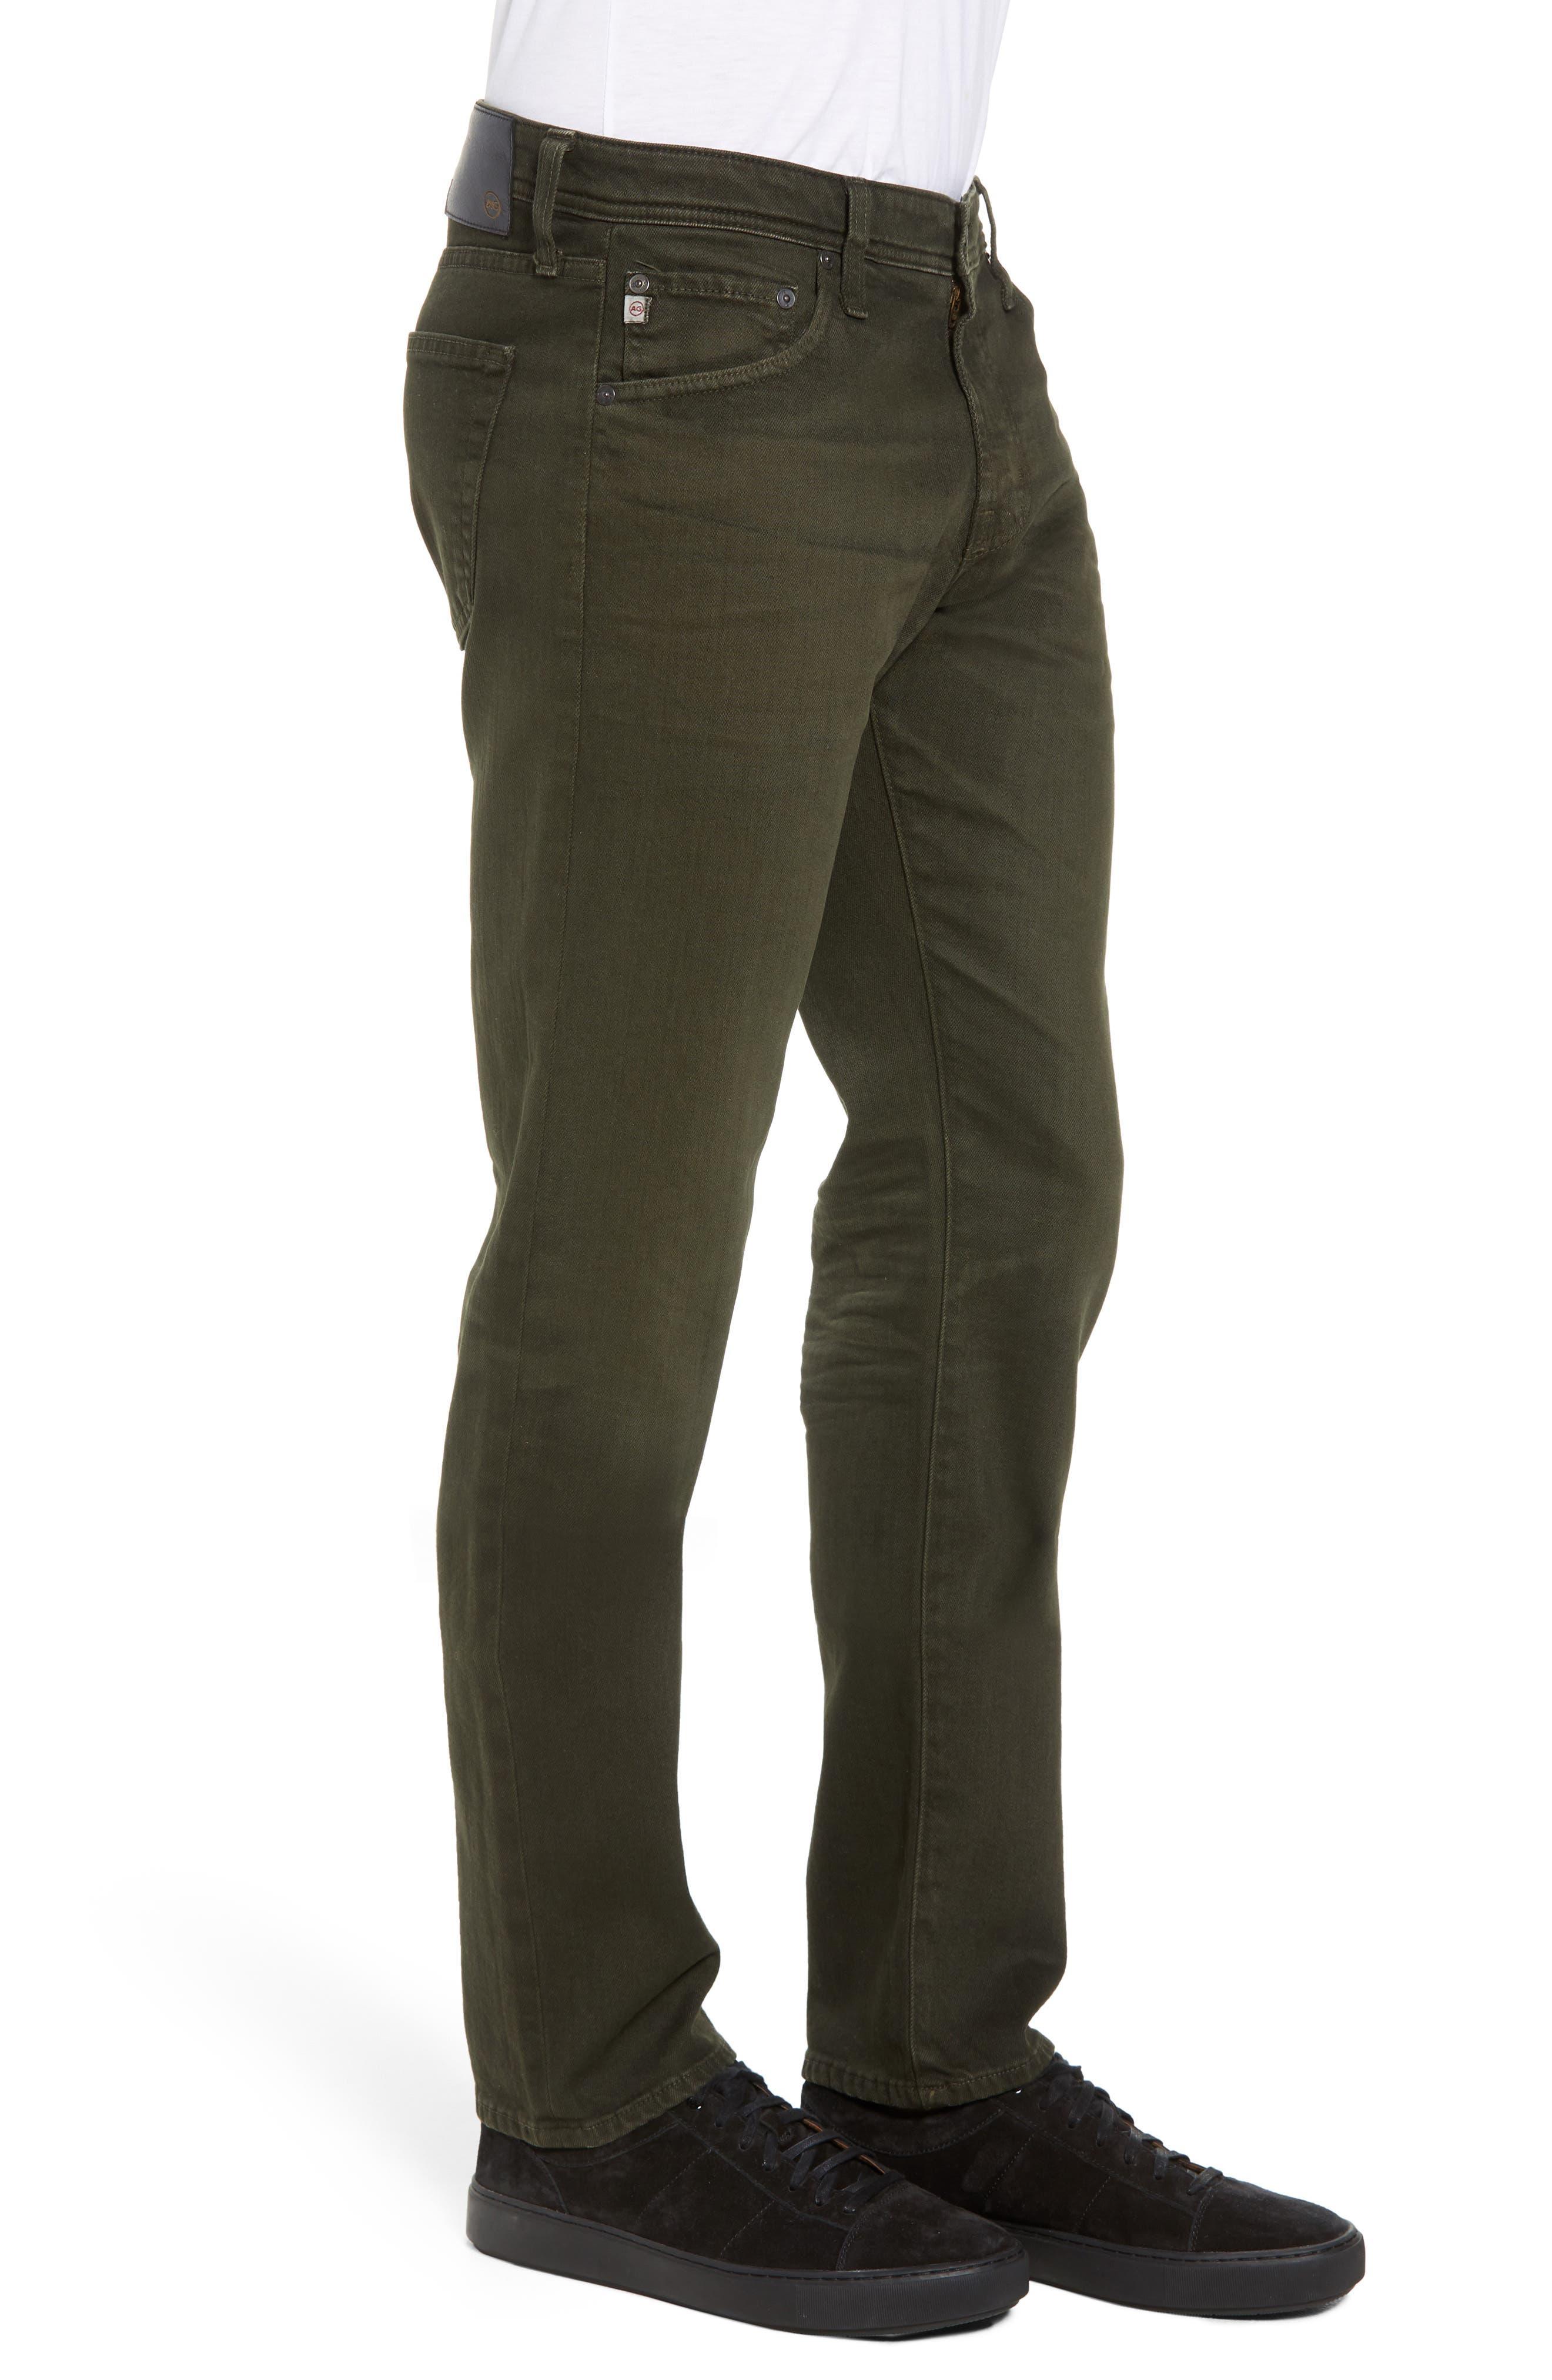 Tellis Slim Fit Jeans,                             Alternate thumbnail 3, color,                             7 YEARS OAK GROVE